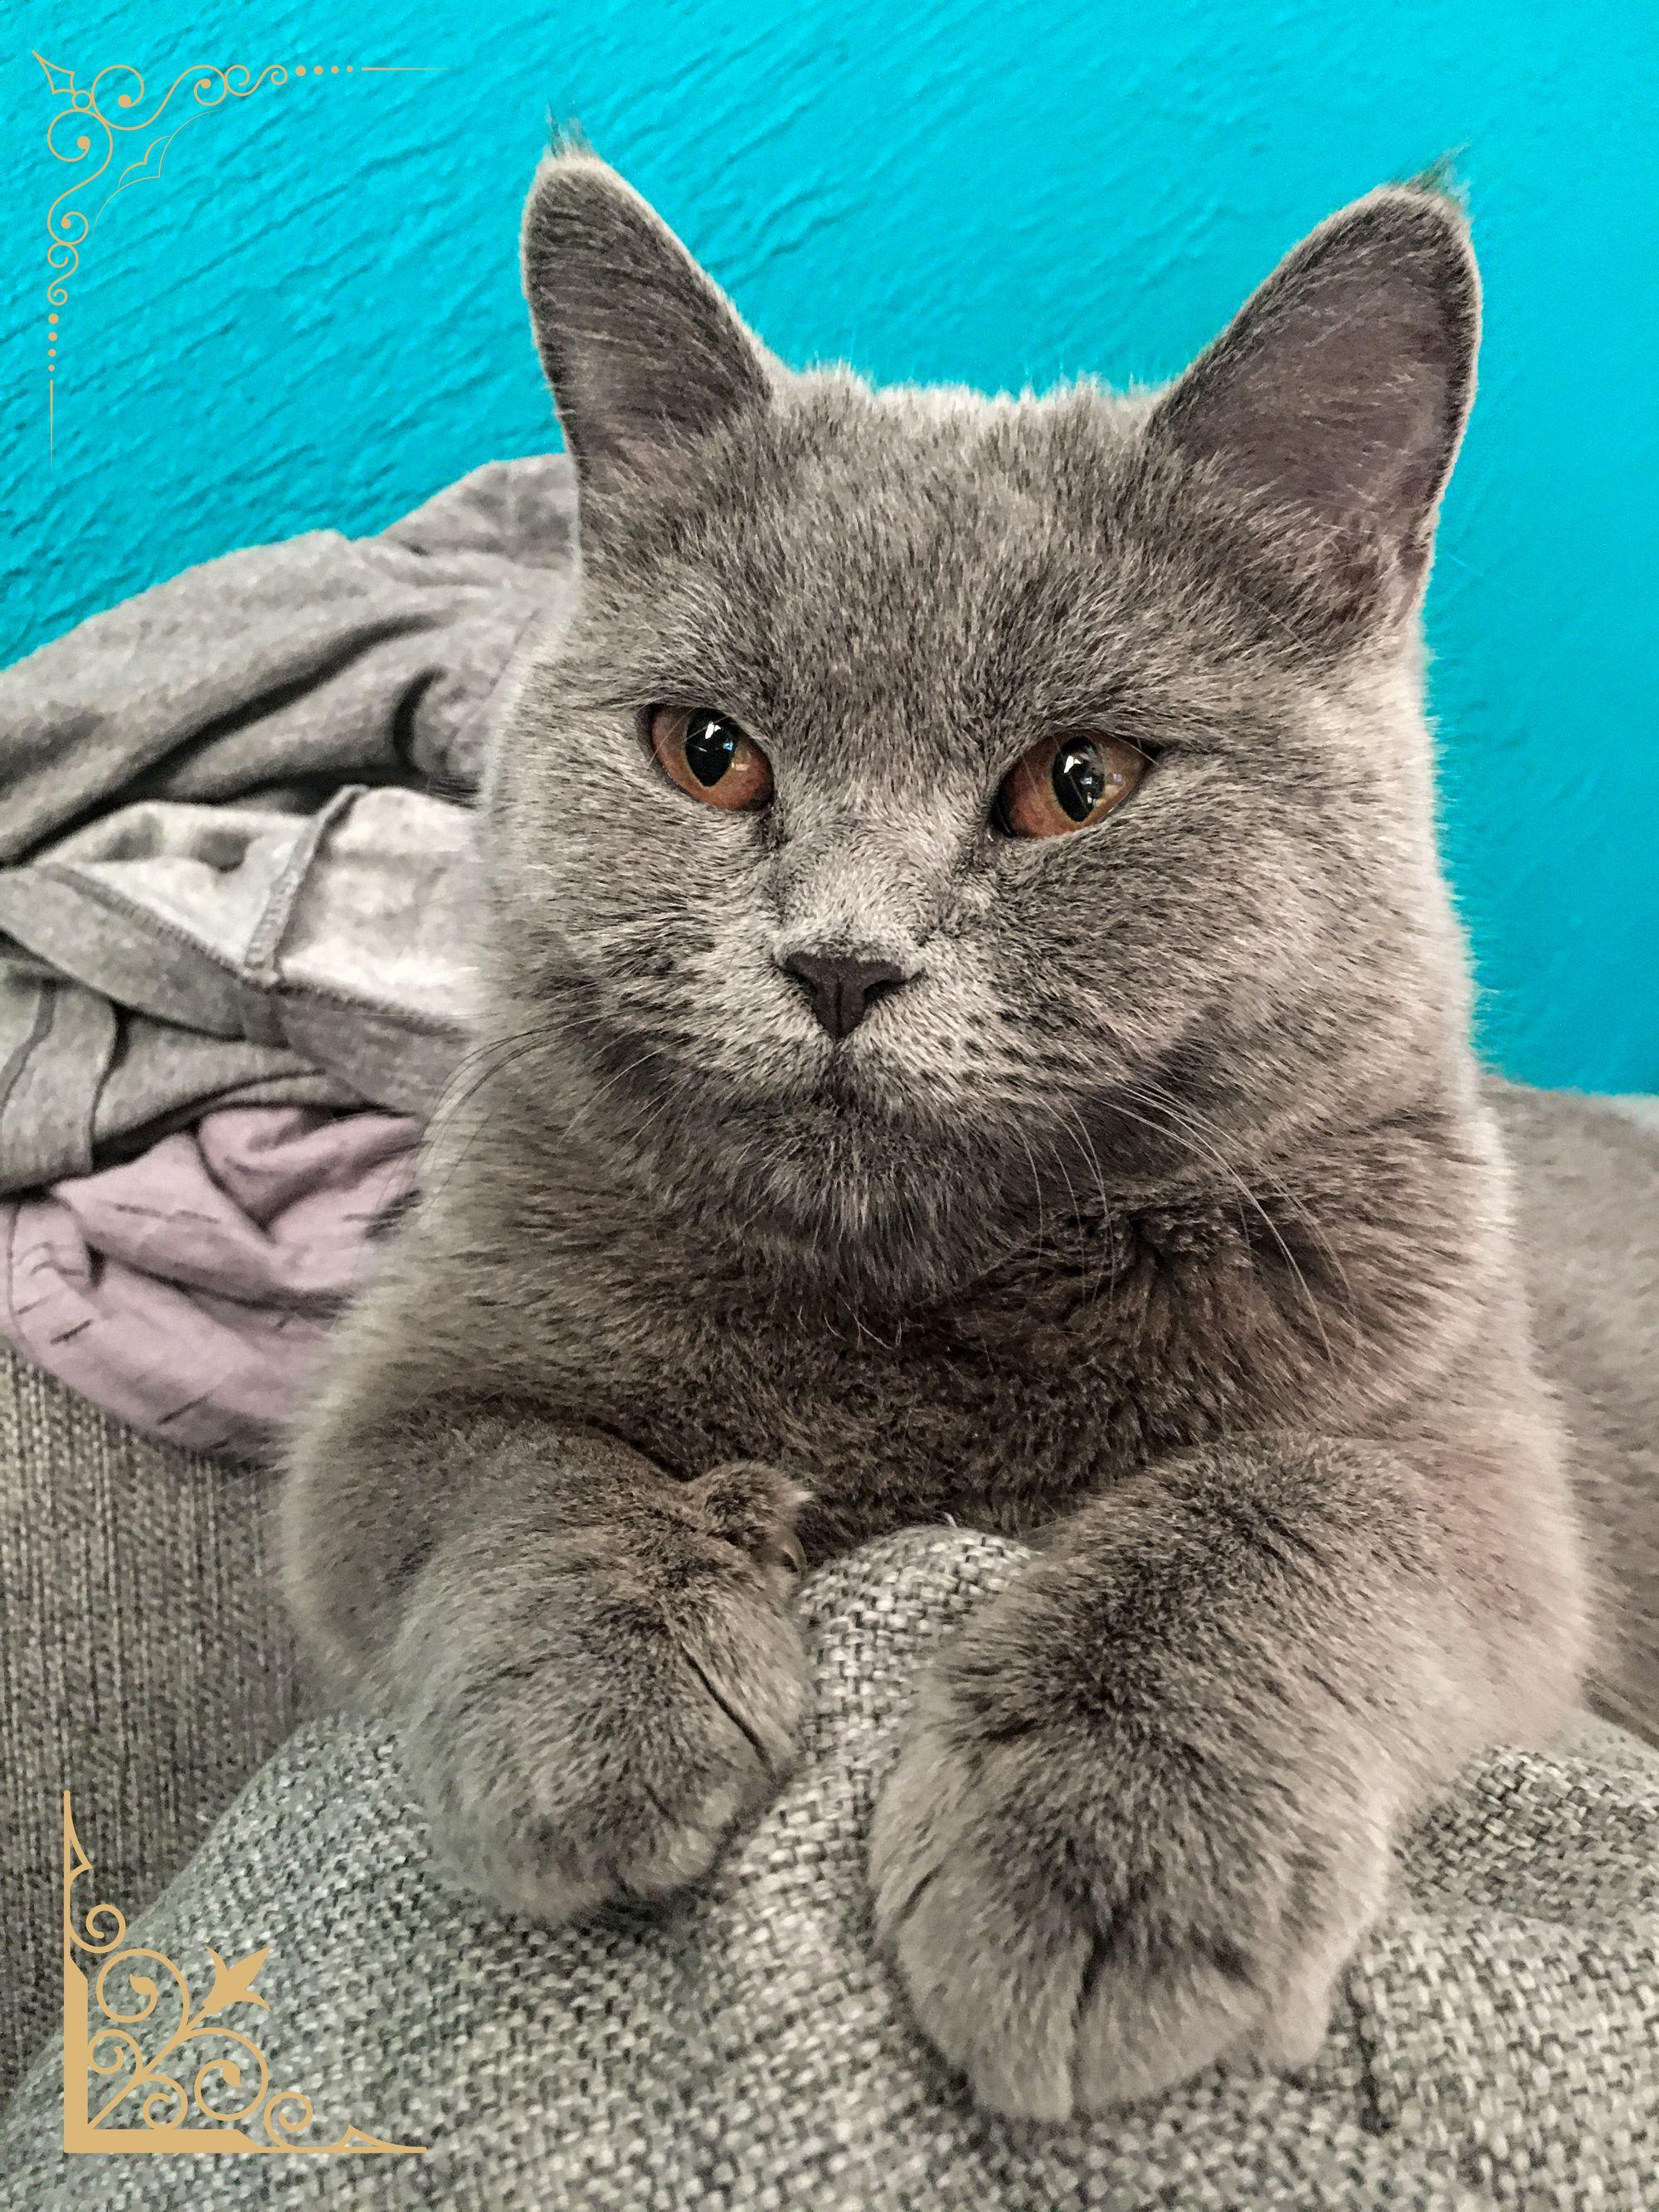 #kittensofinstagram #catlove #cutecat #animal #petstagram #ilovemycat #kittycat #dog #catsofig #catloversclub #instagood #ilovecats #blackcat #dogsofinstagram #catsofinsta #katze #catslover #caturday #catsoftheworld #photooftheday #catphoto #chat #catsofworld #neko #katzen #catsoftheday #features #catscatscats #nature #gatosdeinstagram